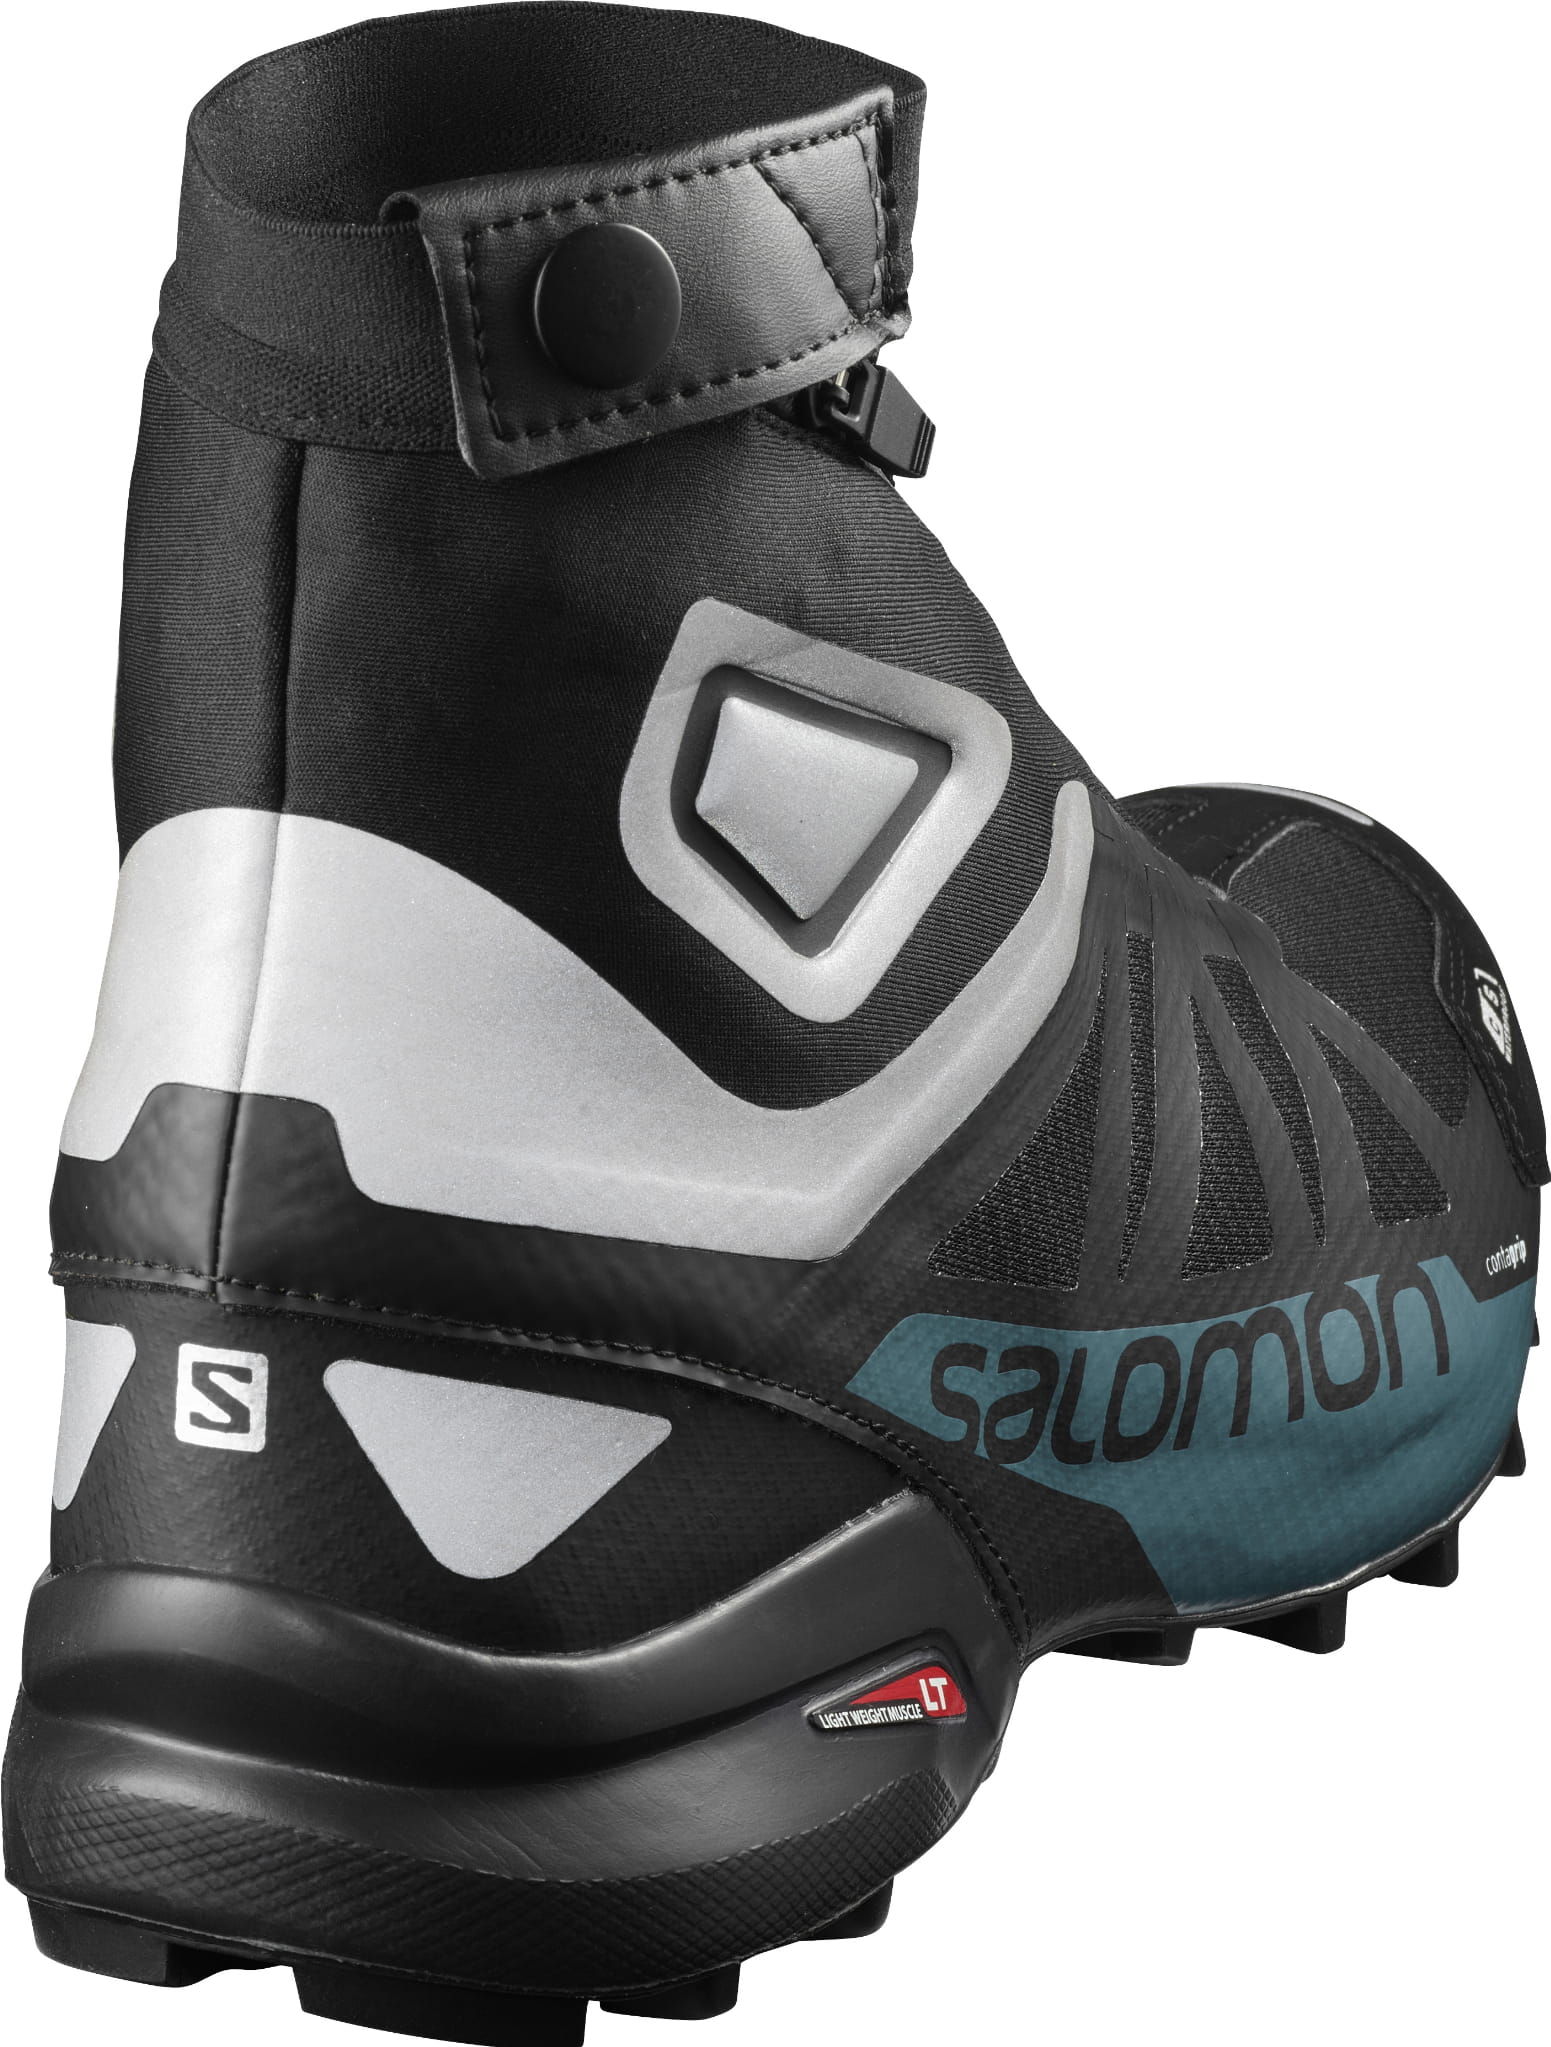 BUTY SALOMON SNOWCROSS 2 CSWP BlackReflec 404704